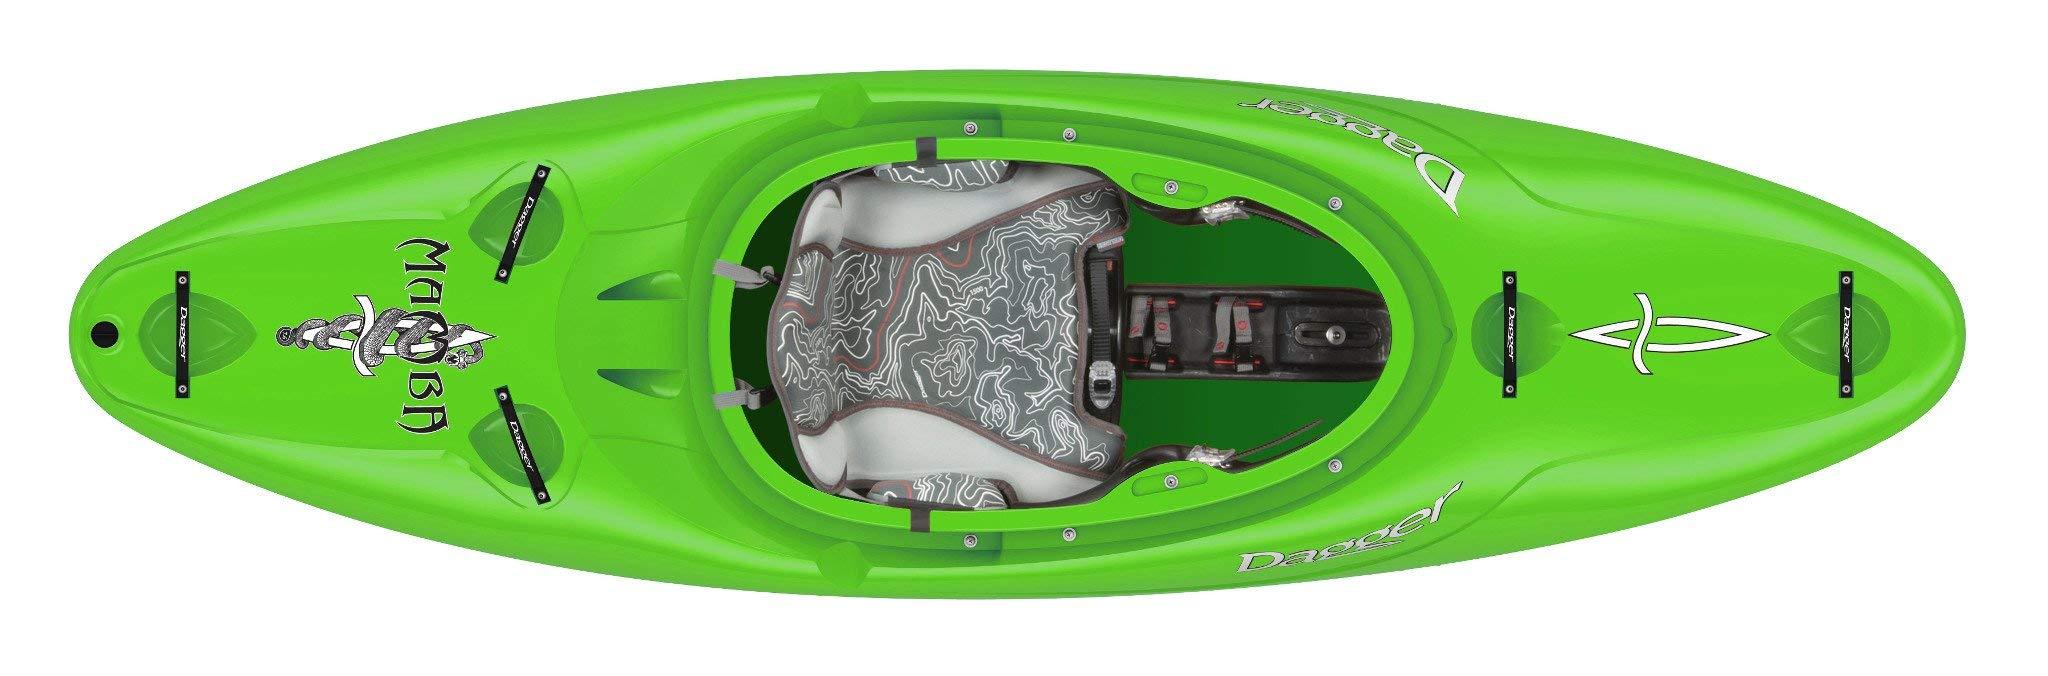 Dagger Mamba Versatile Whitewater Kayak - 7.6, Lime by Dagger